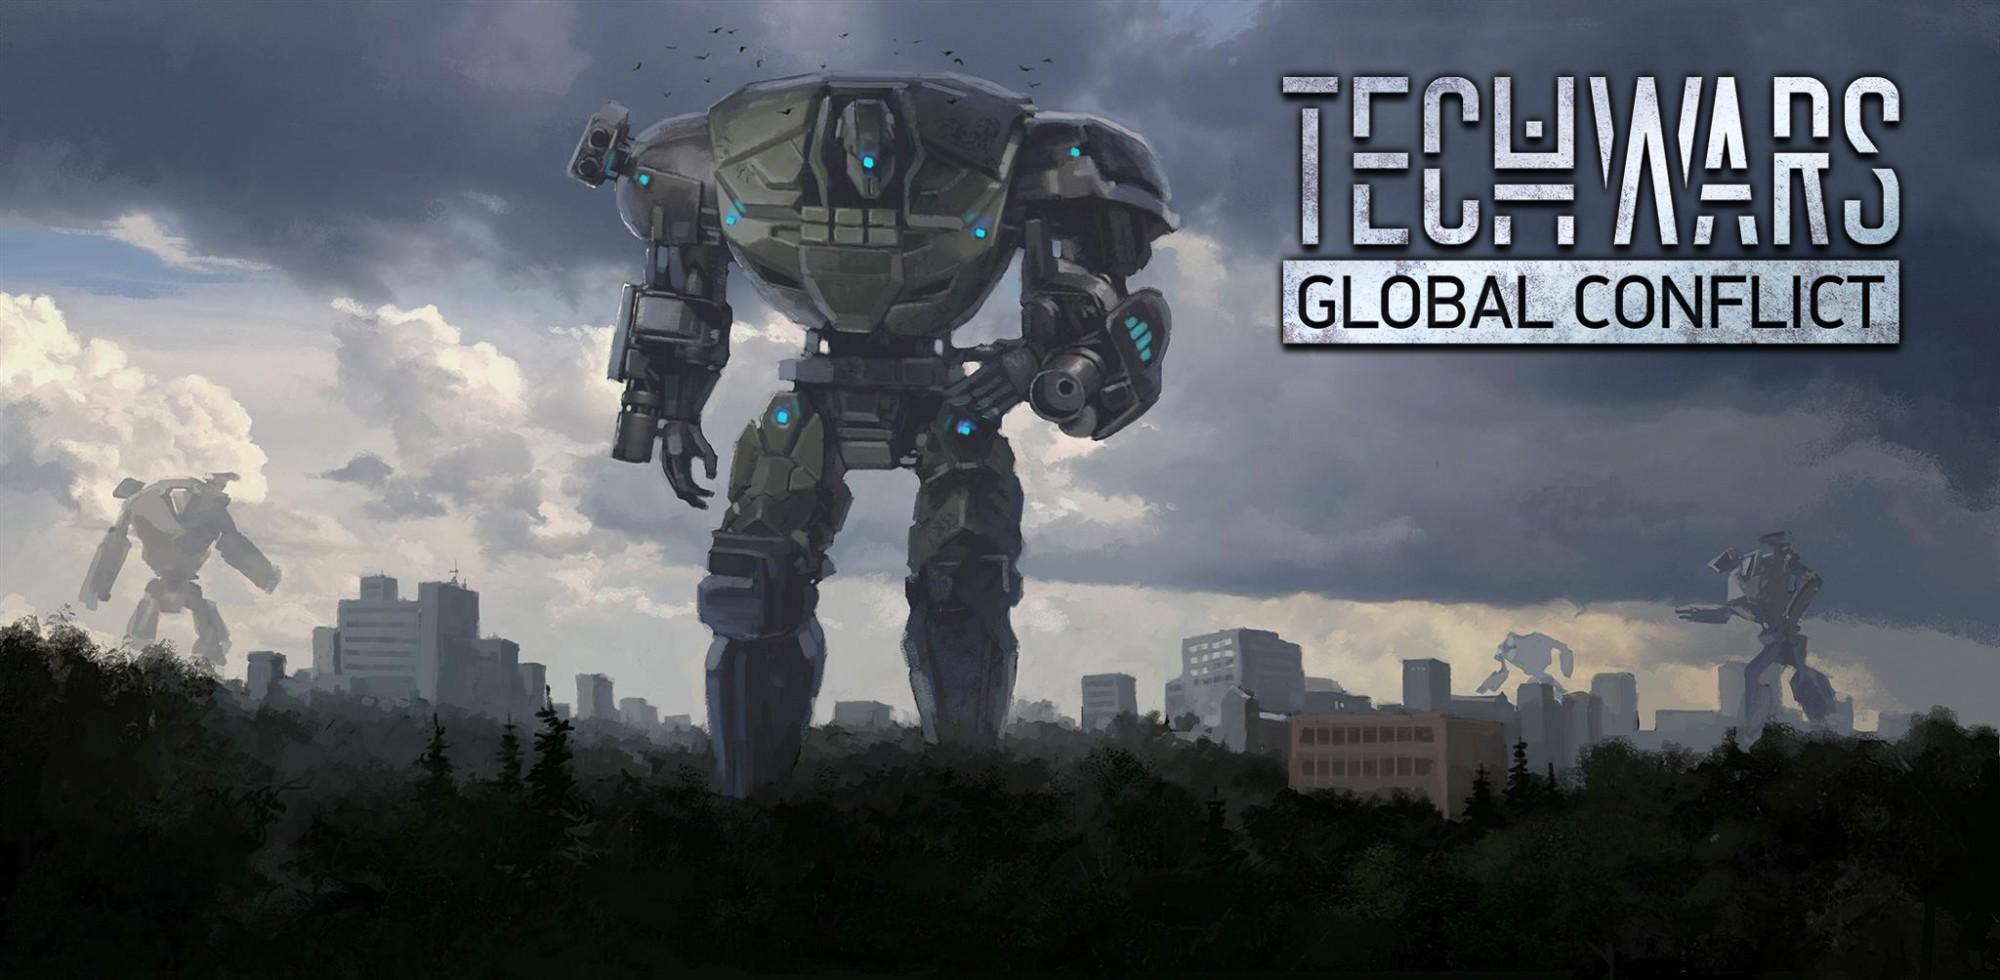 Mmedia DISKORD server Vam poklanja Steam Igricu - TECHWARS GLOBAL CONFLICT | (Podeljeno za veceras 6/10)  #dokadlc1  #MmediaGiveaway